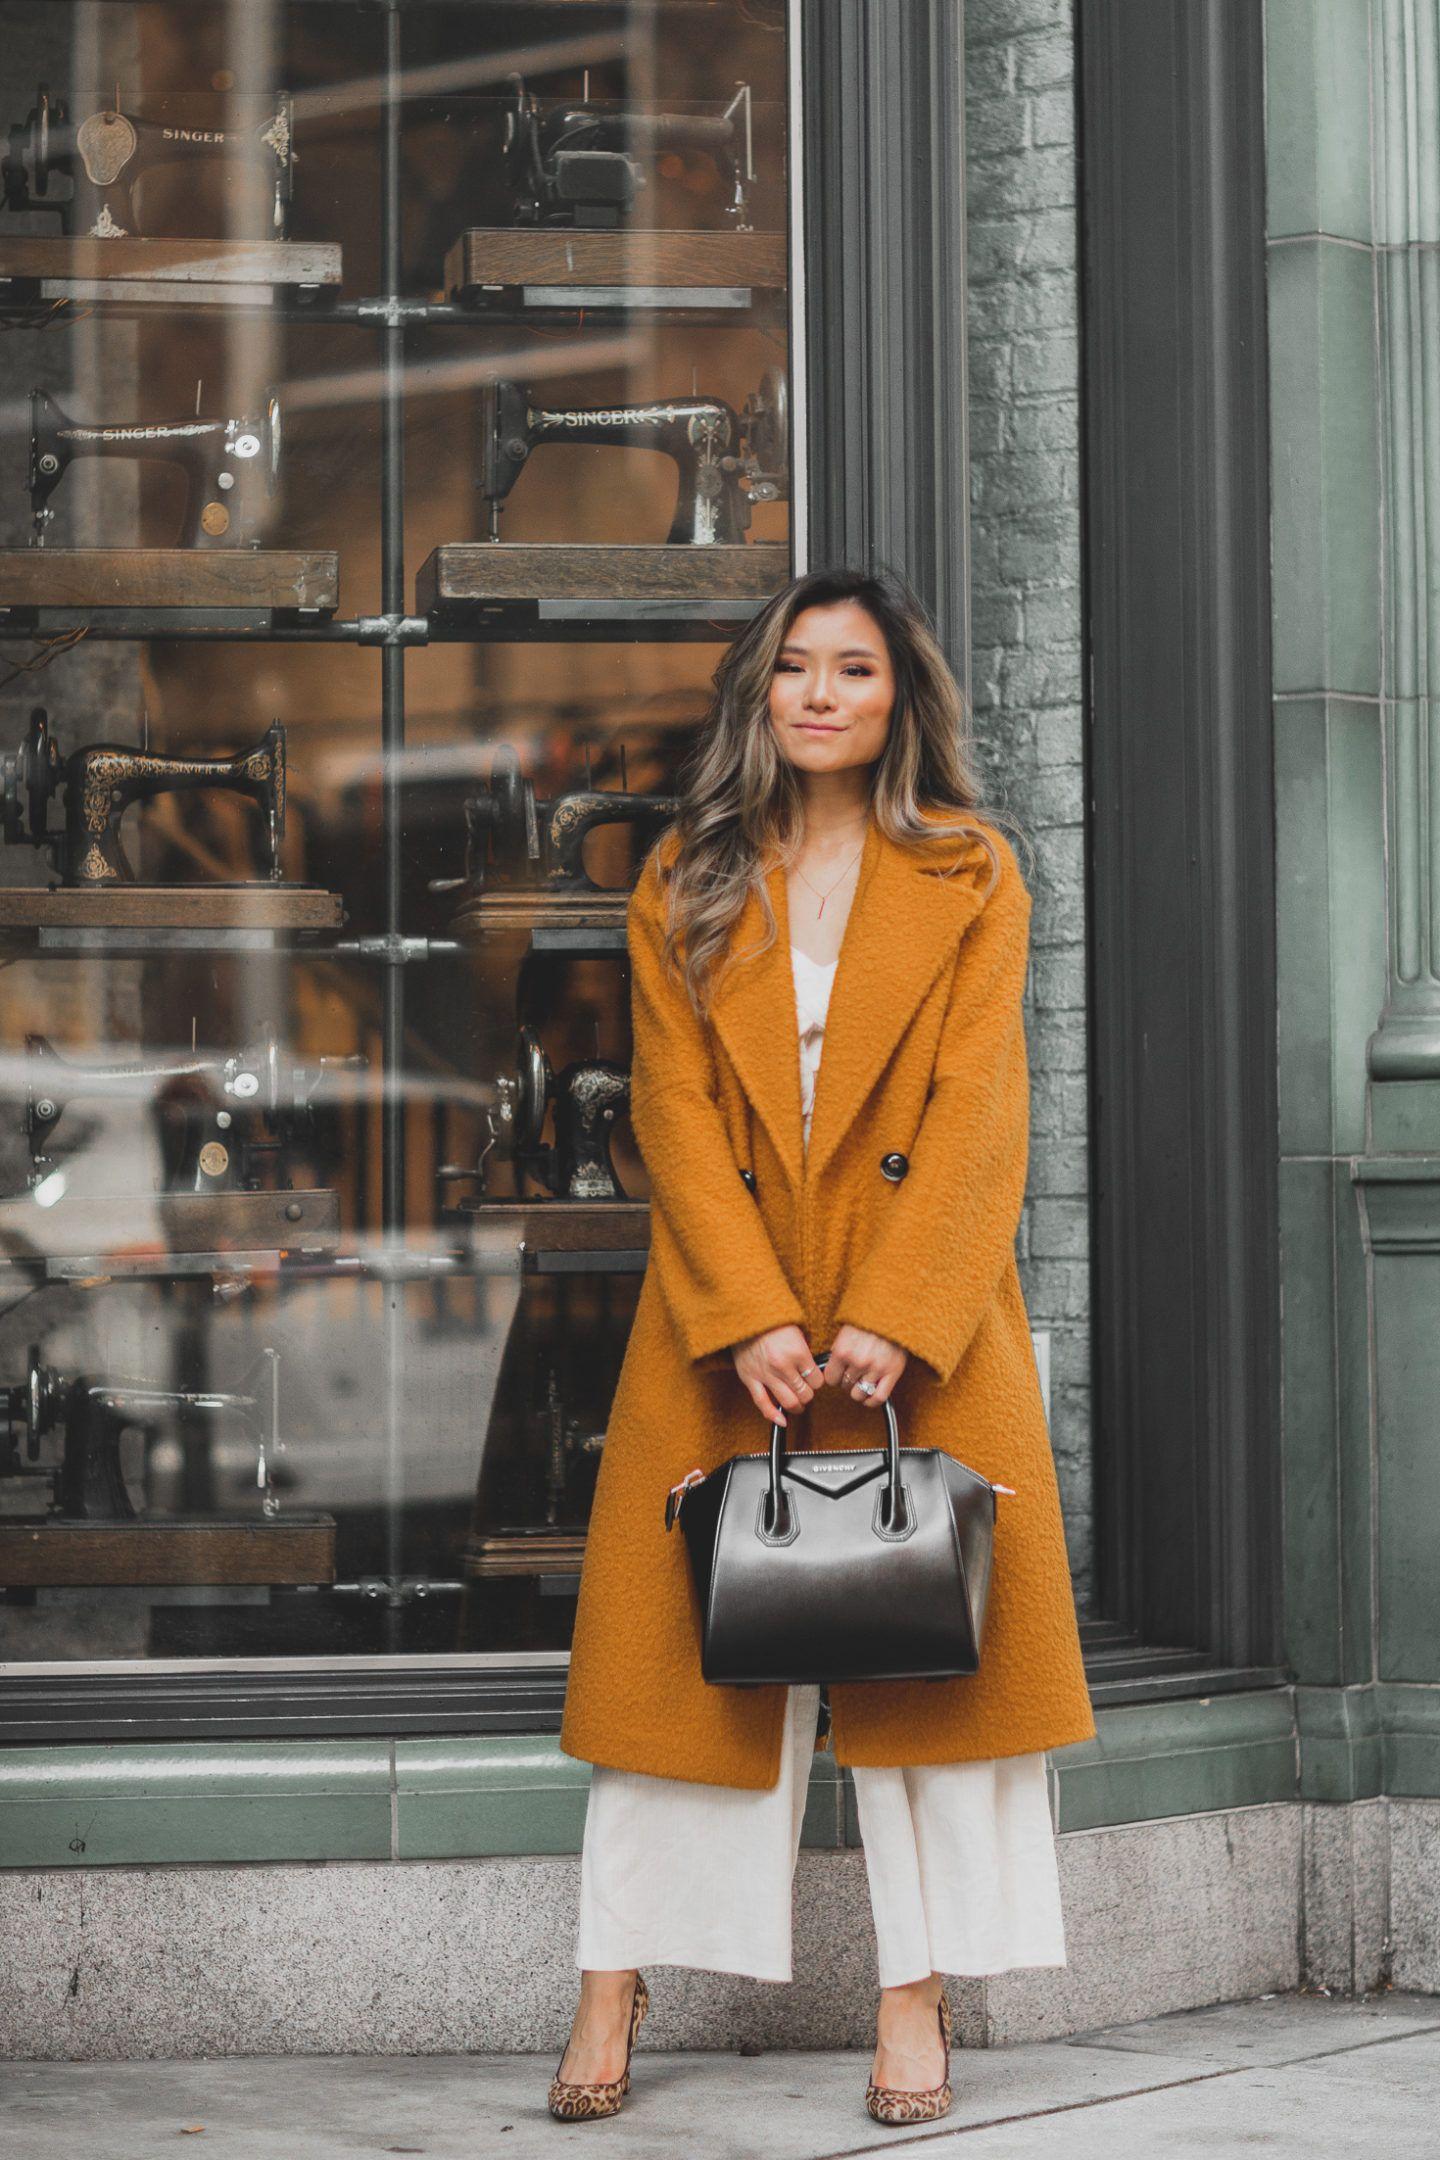 5d731a3b174 Fashion blogger Miss Louie wearing topshop boucle coat givenchy small  antigona bag and sam edelman hazel pumps in union square san francisco